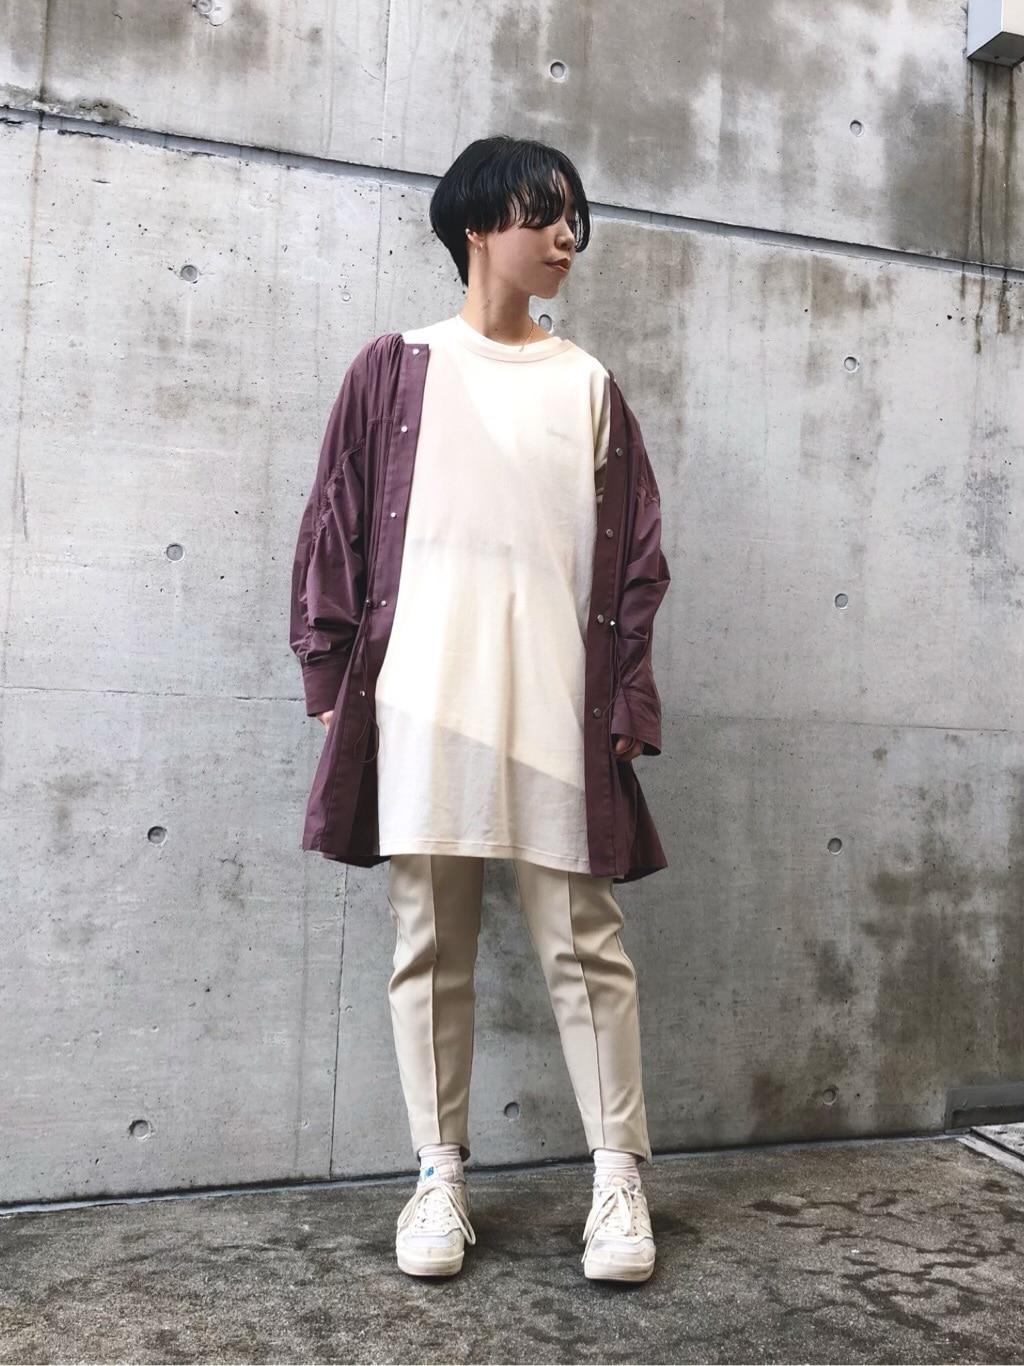 caph troupe 代々木上原路面 身長:160cm 2019.12.13